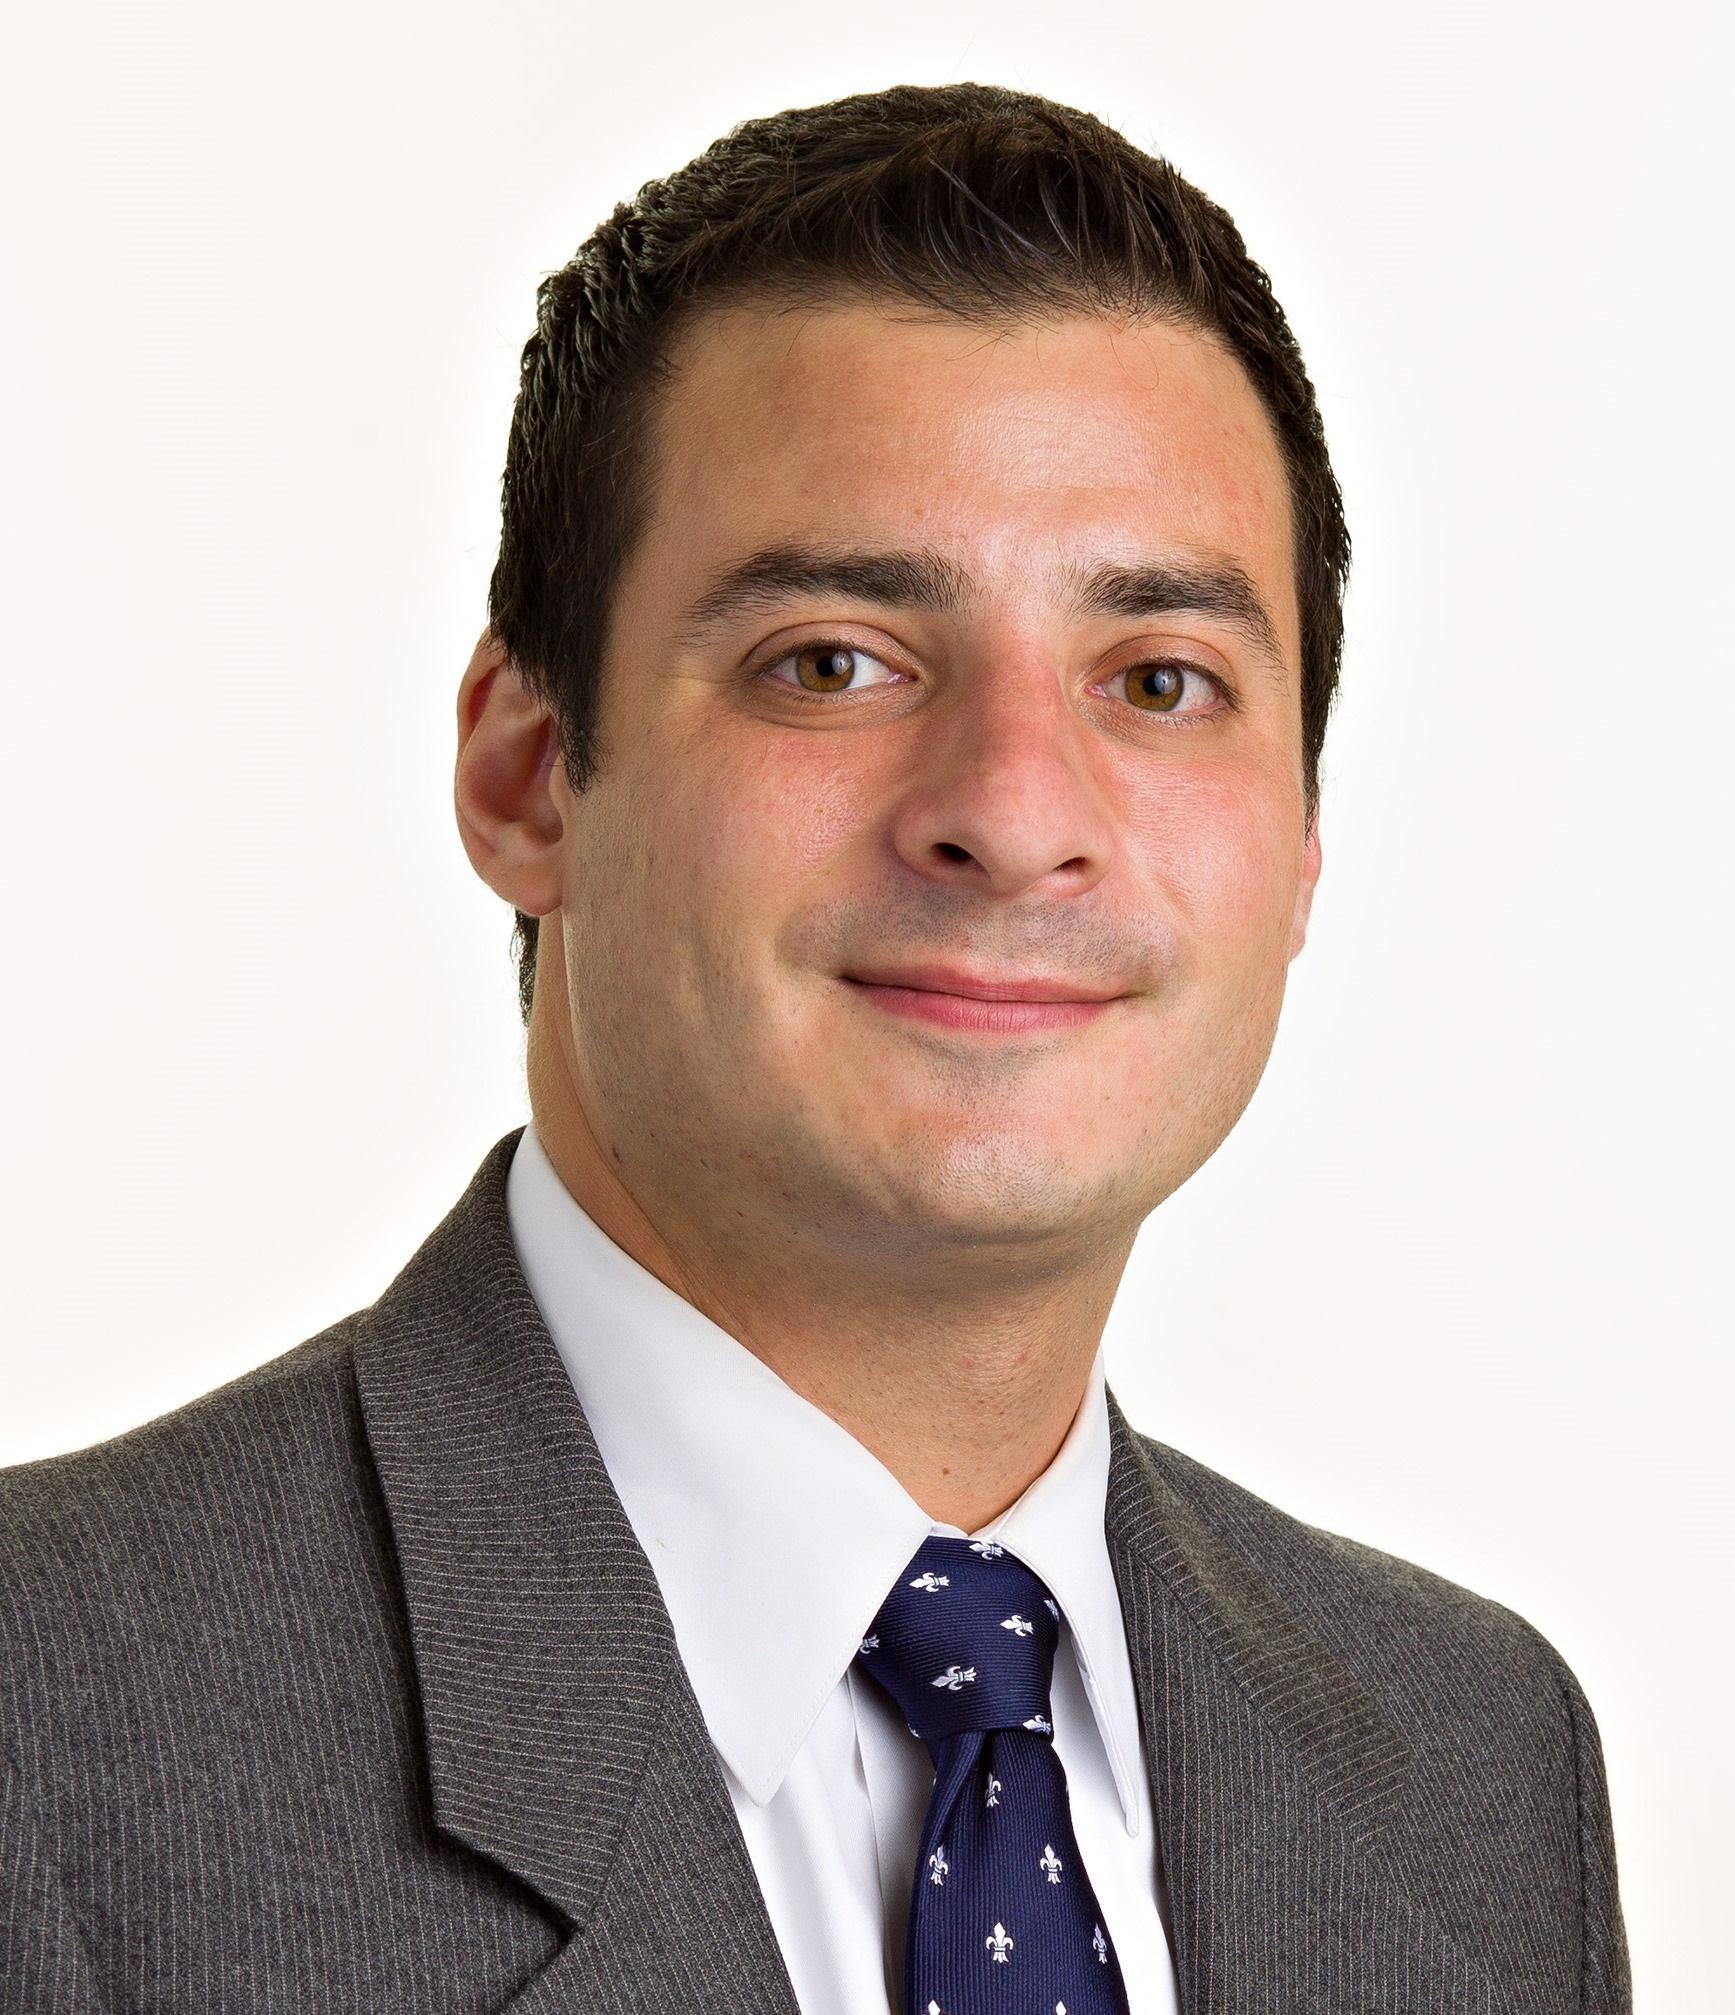 Aaron Wodin-Schwartz